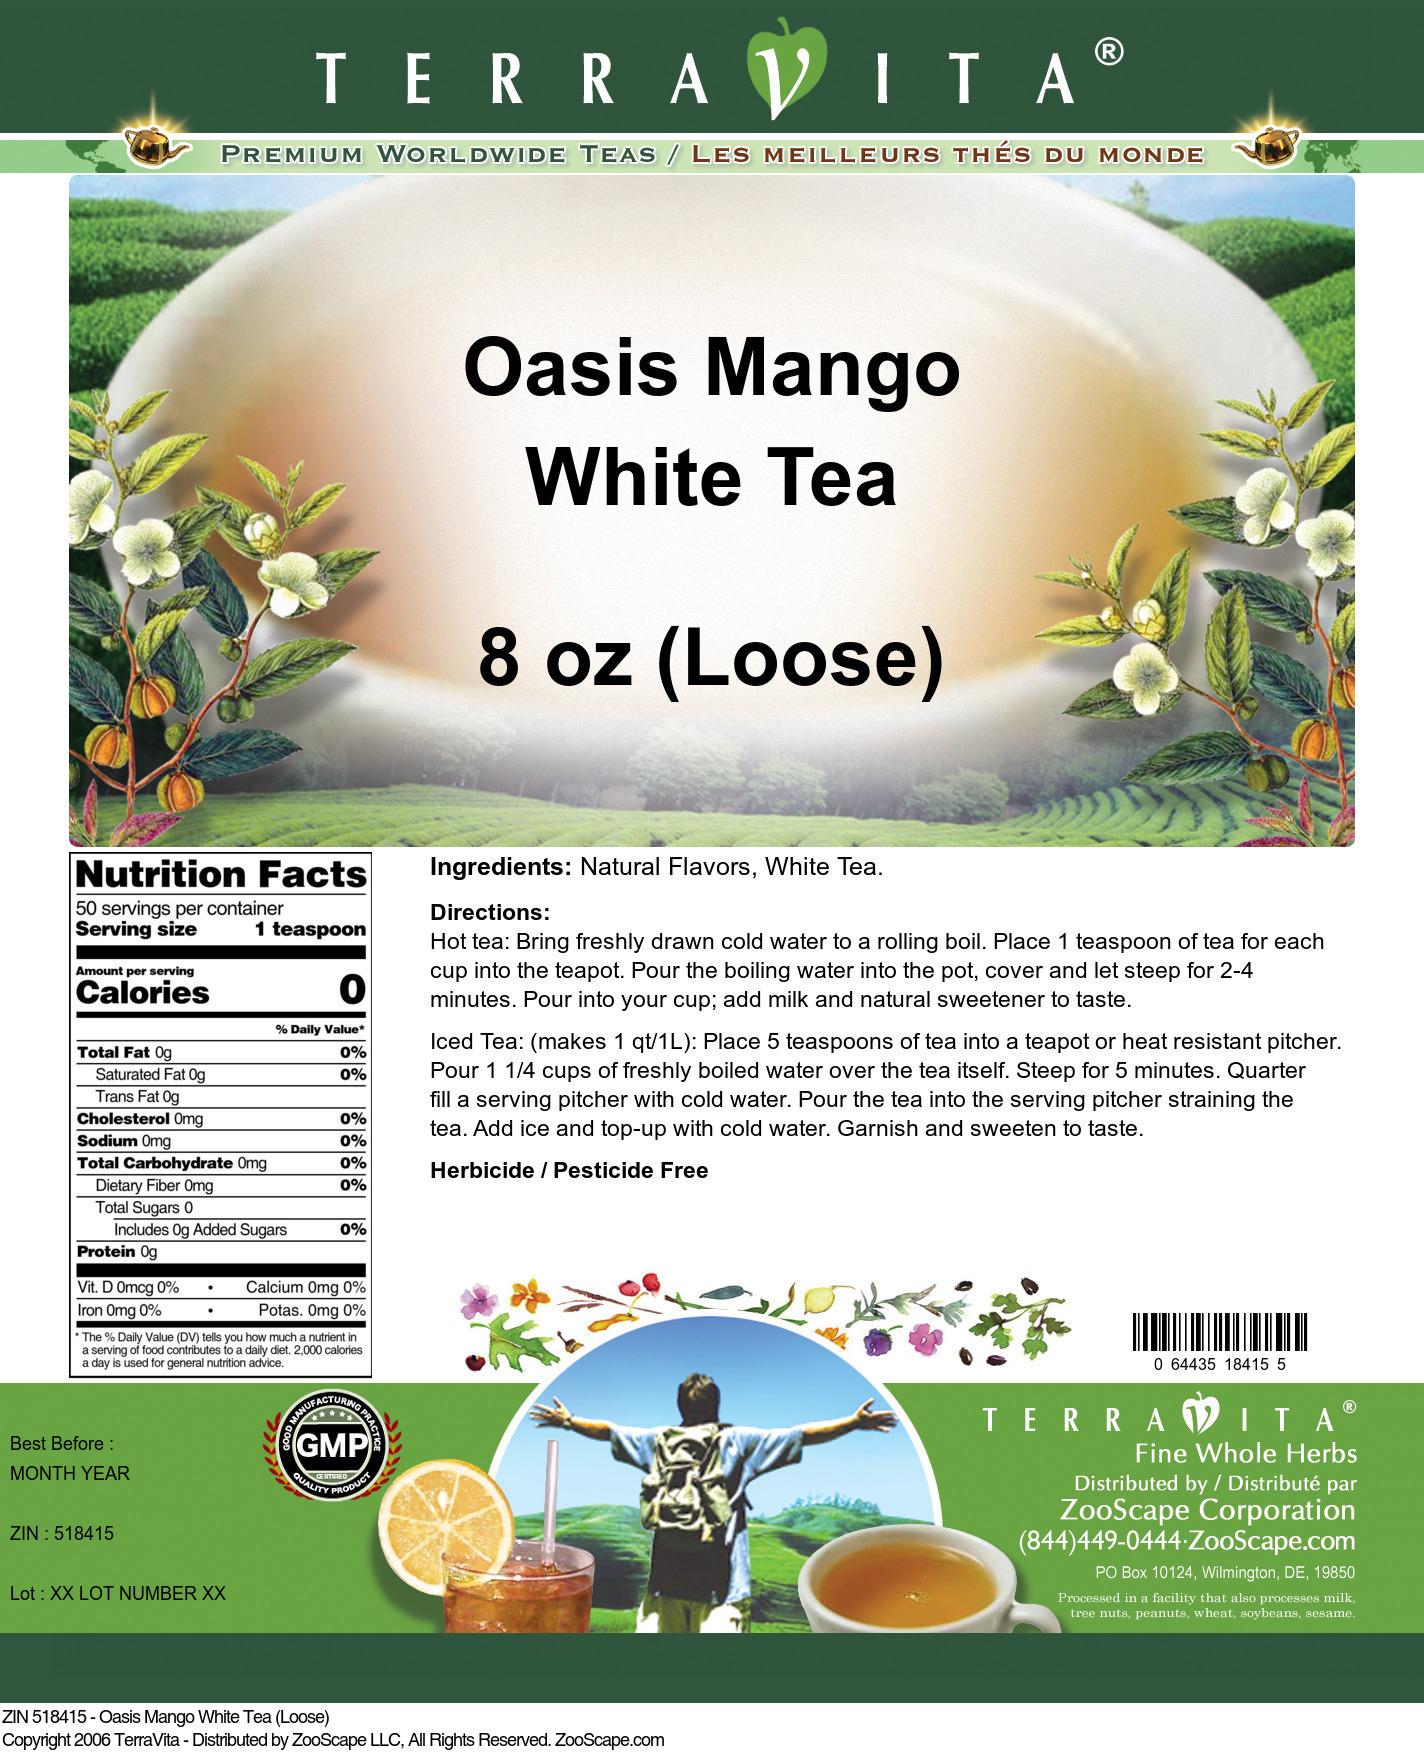 Oasis Mango White Tea (Loose)